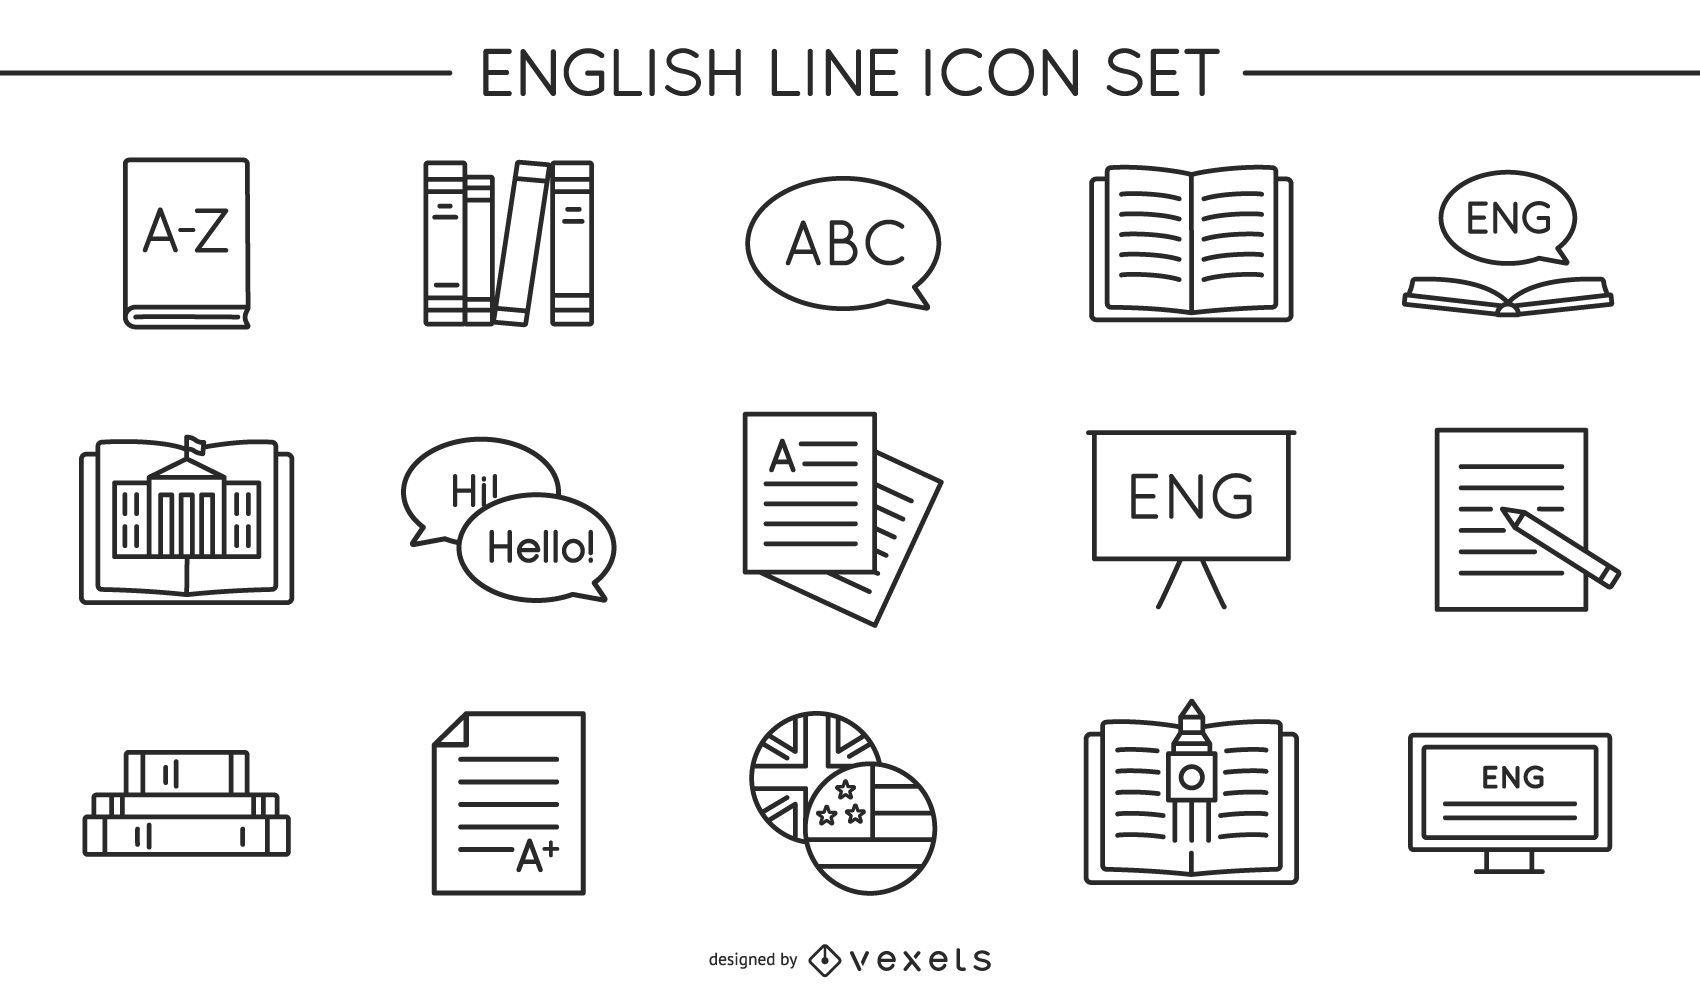 English line icon set